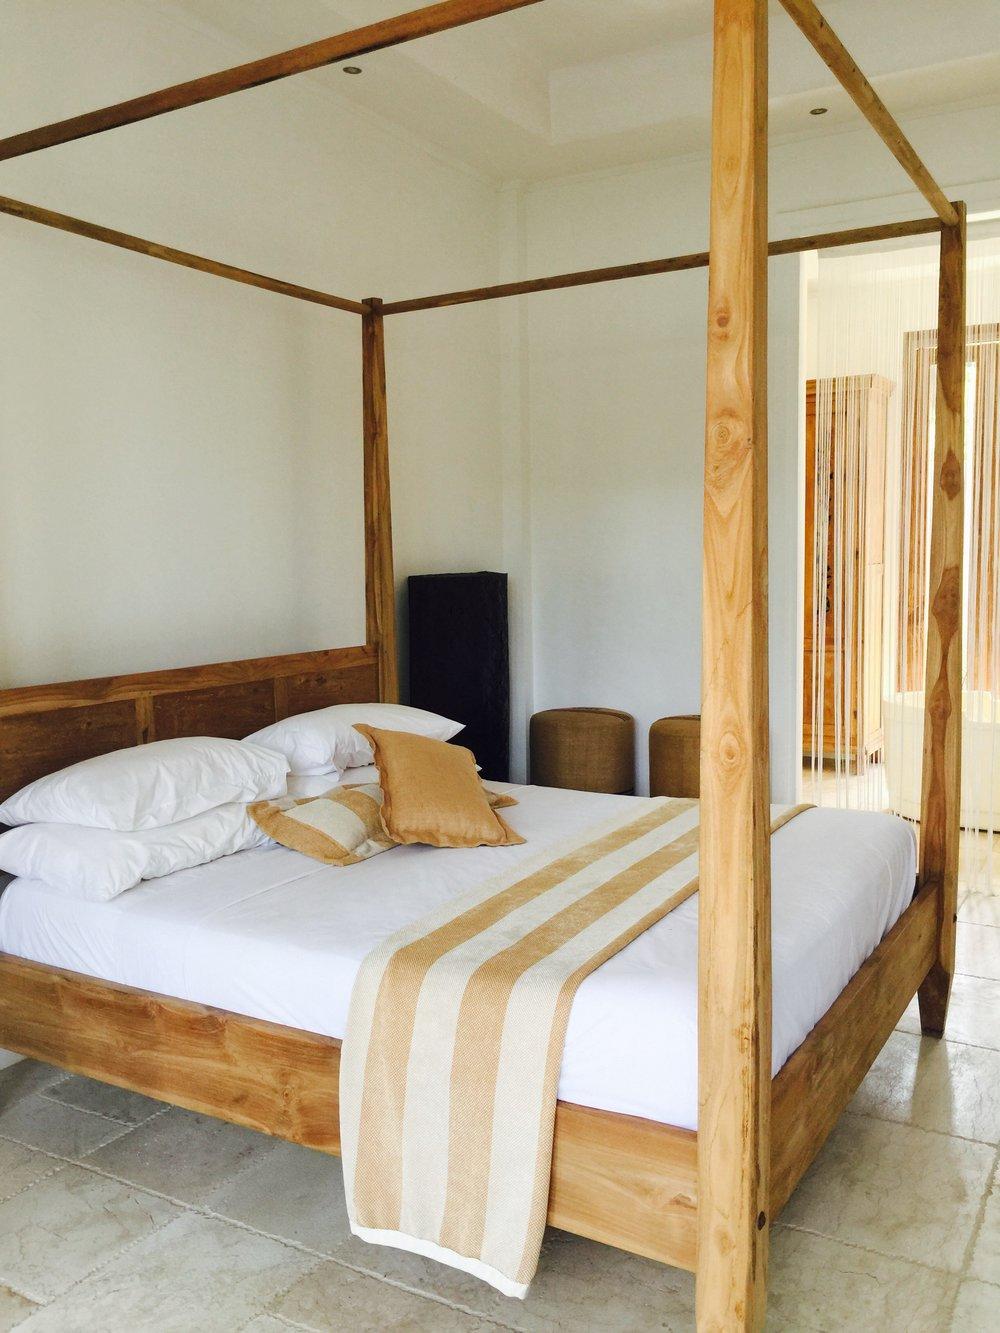 Zimmer200.jpg